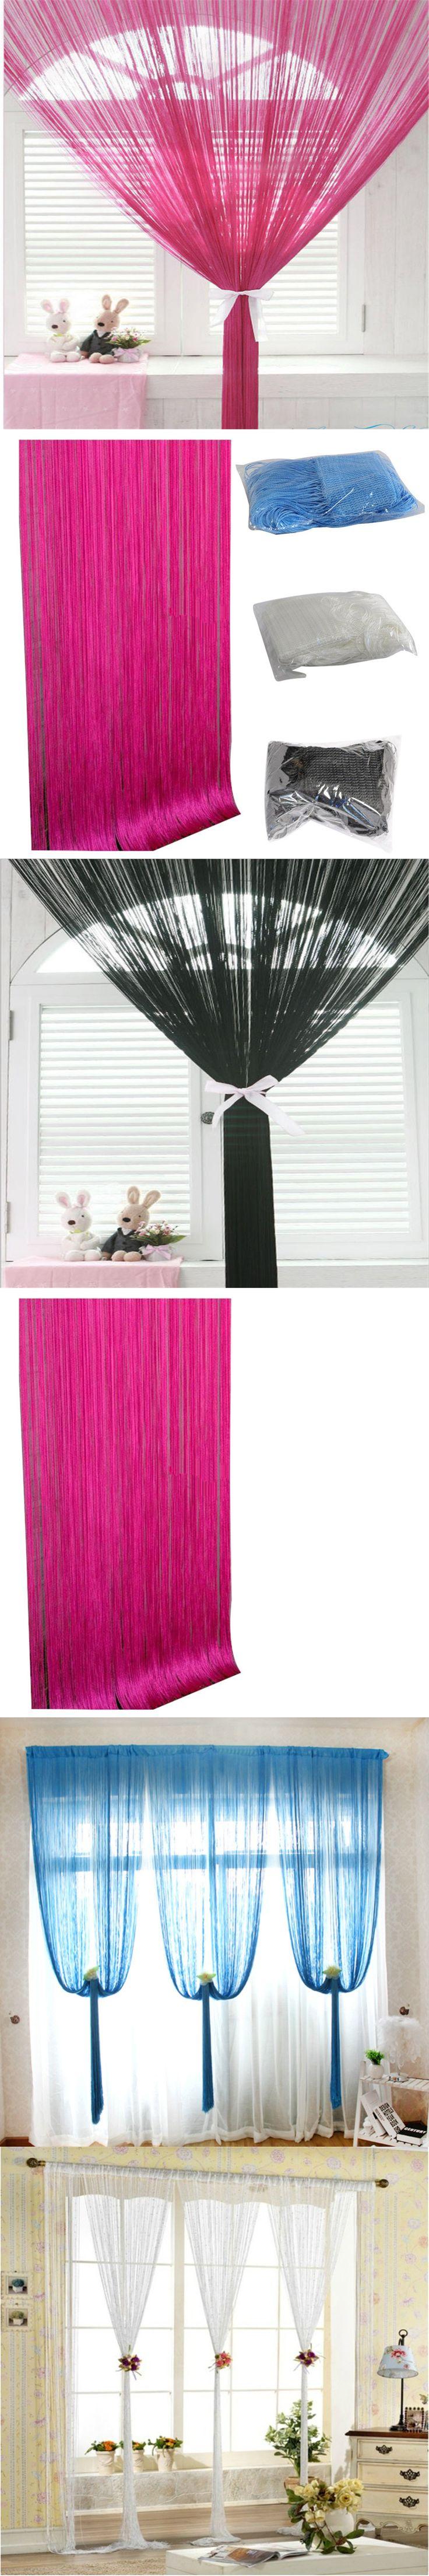 String curtain ideas - Special Line Tassel String Curtain 100 200cm Drape Purdah Interior Valance Curtains Decorative French Window Upscale Hotel